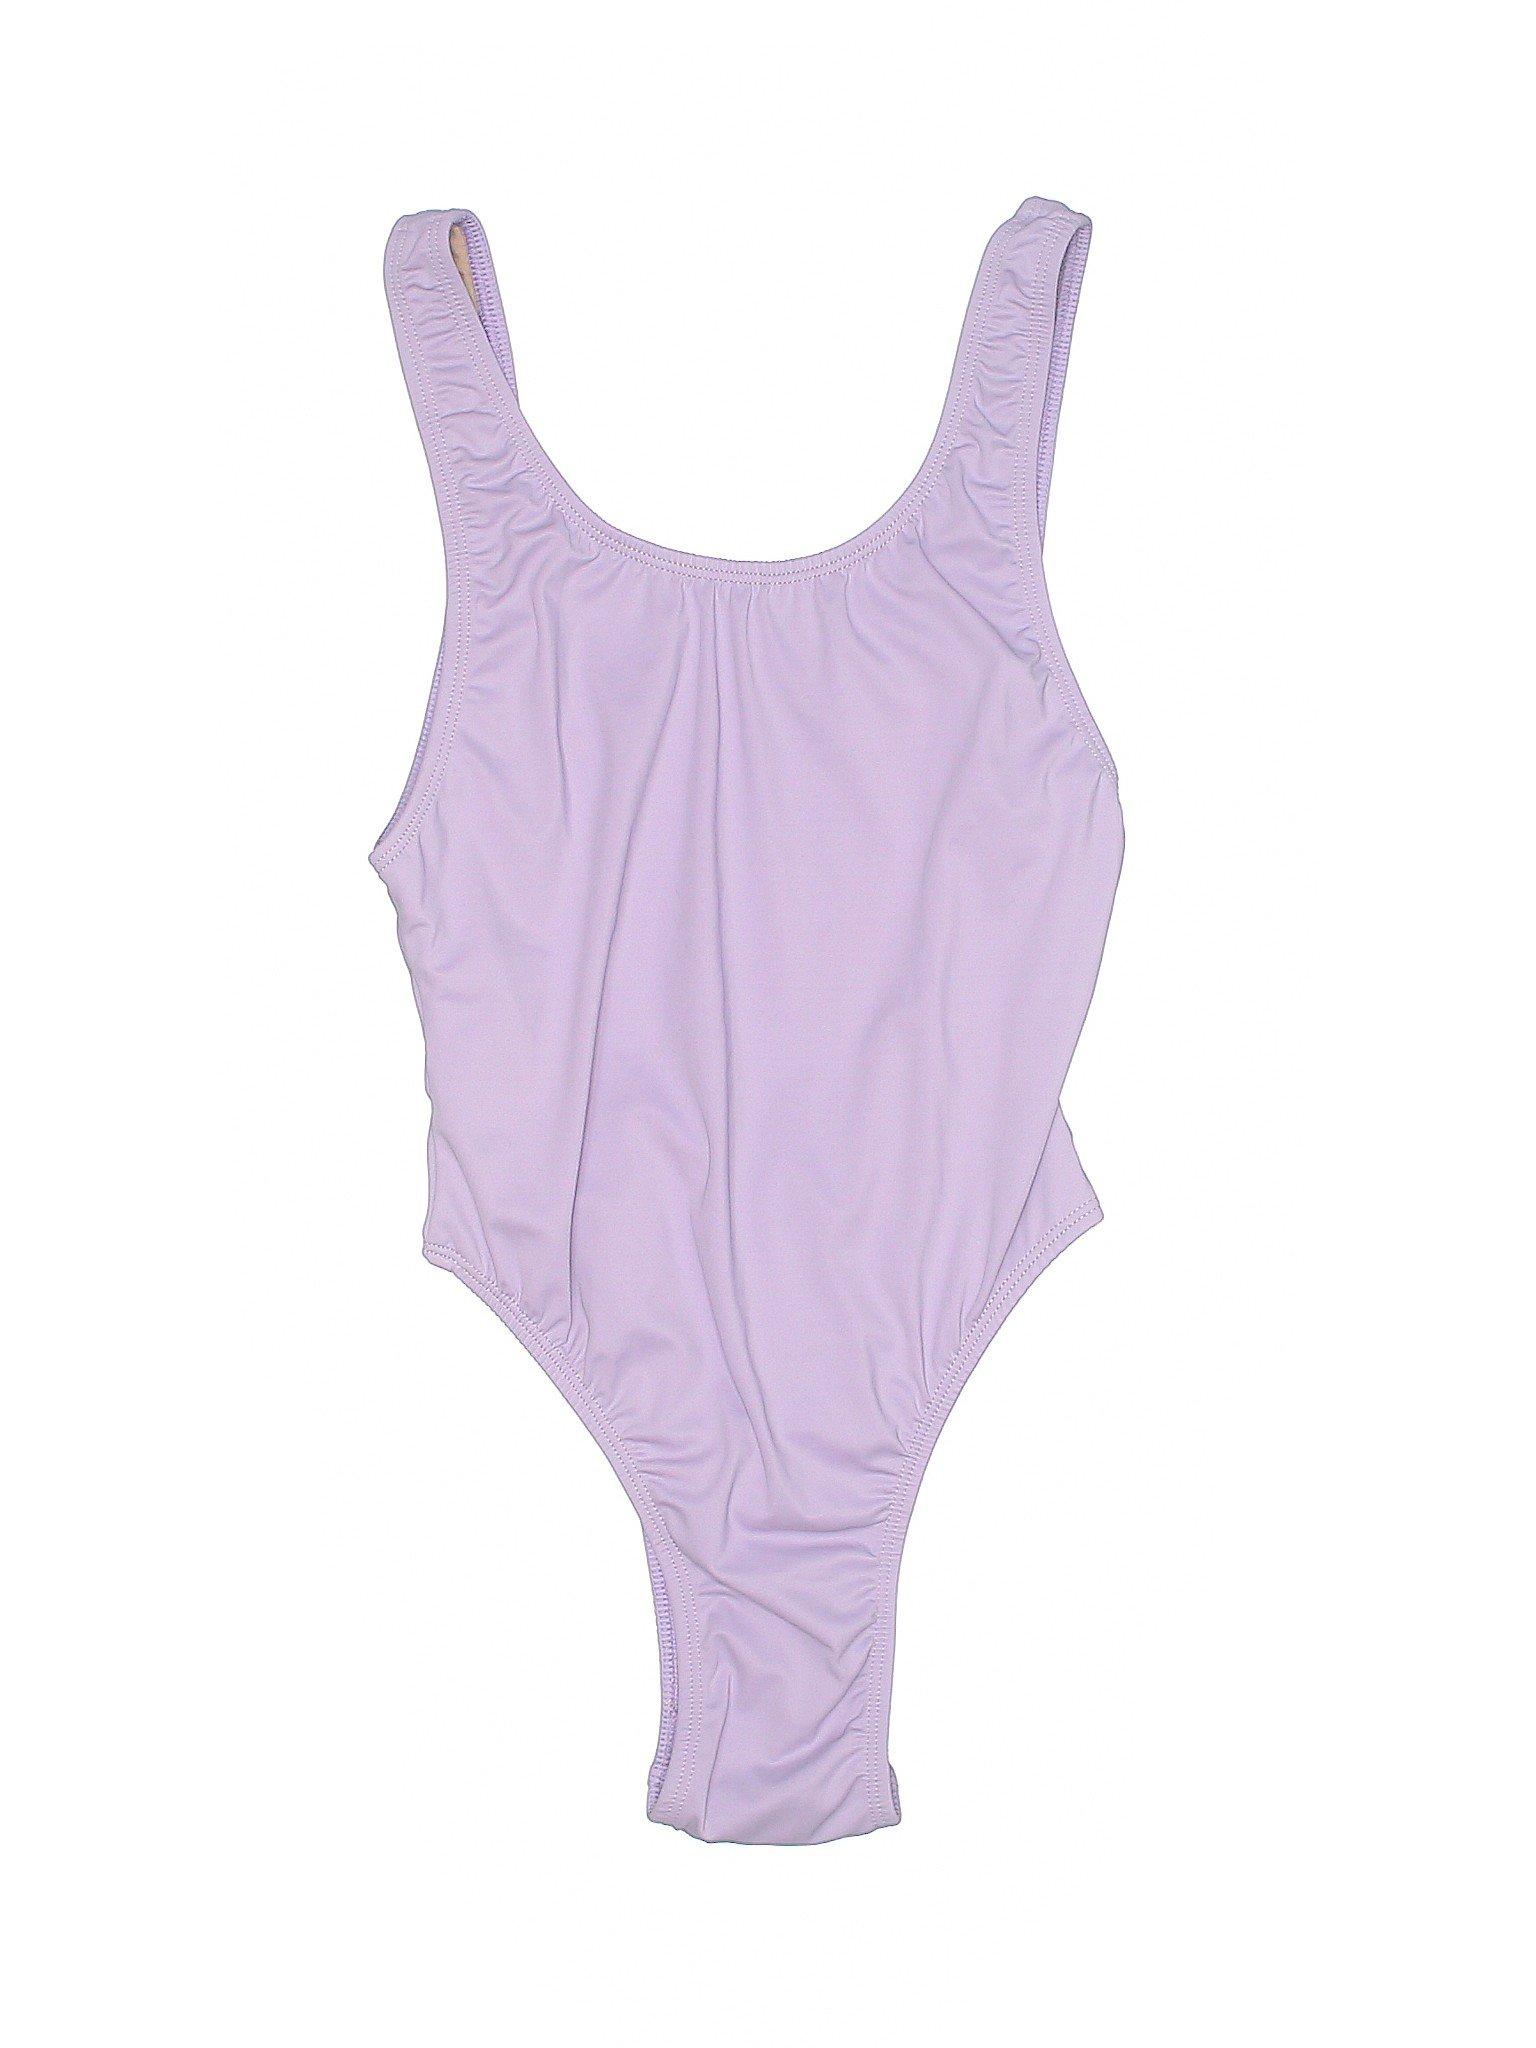 Zuliana Piece Swimsuit Boutique Boutique One Zuliana UH16OqnE